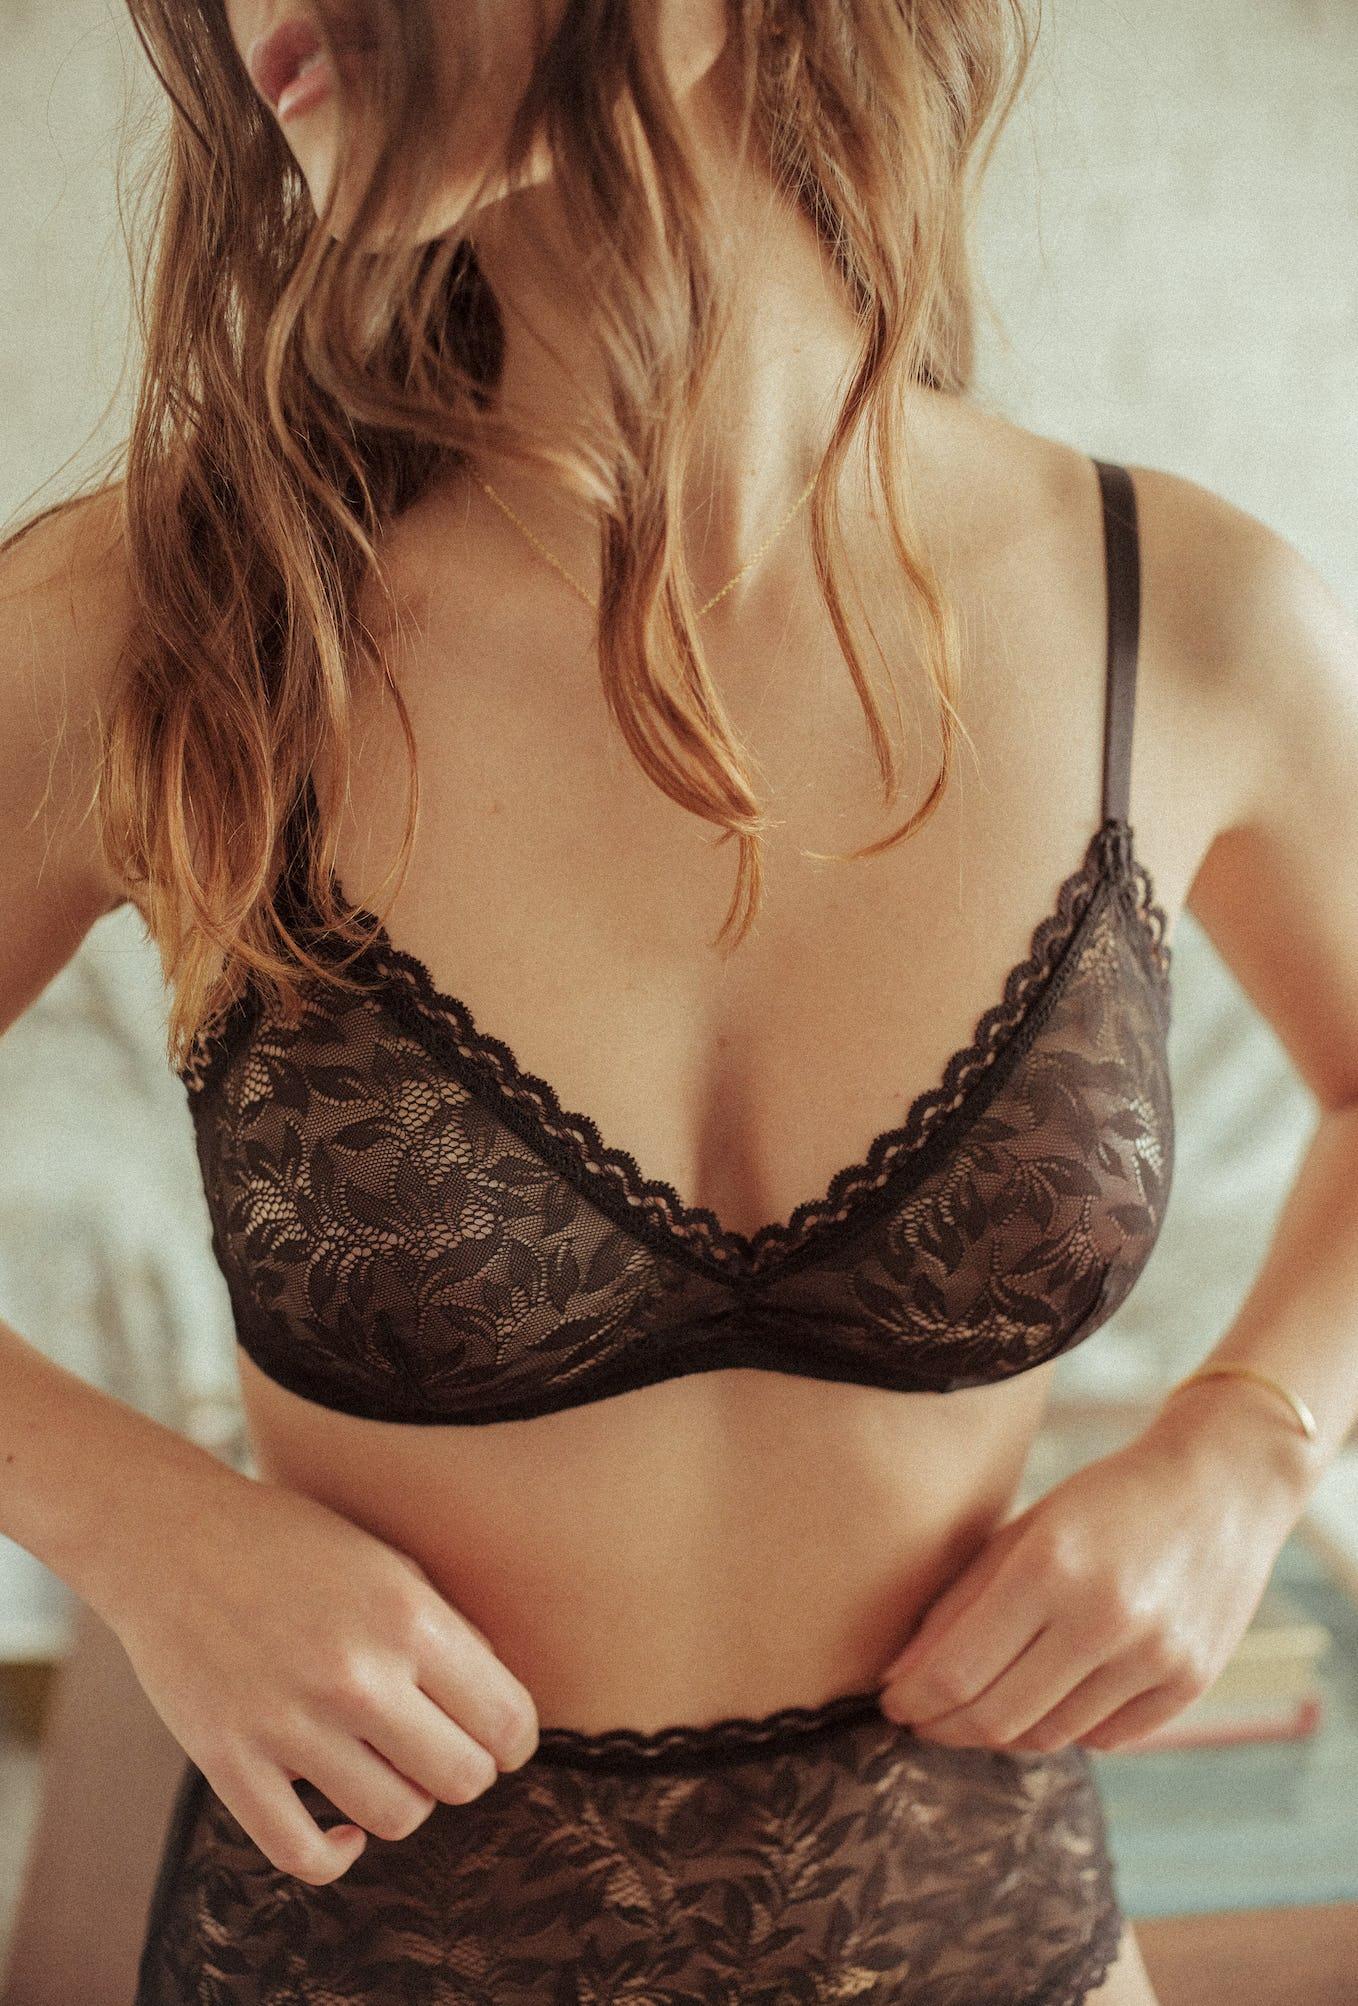 Les flots du coeur Triangle bra in black